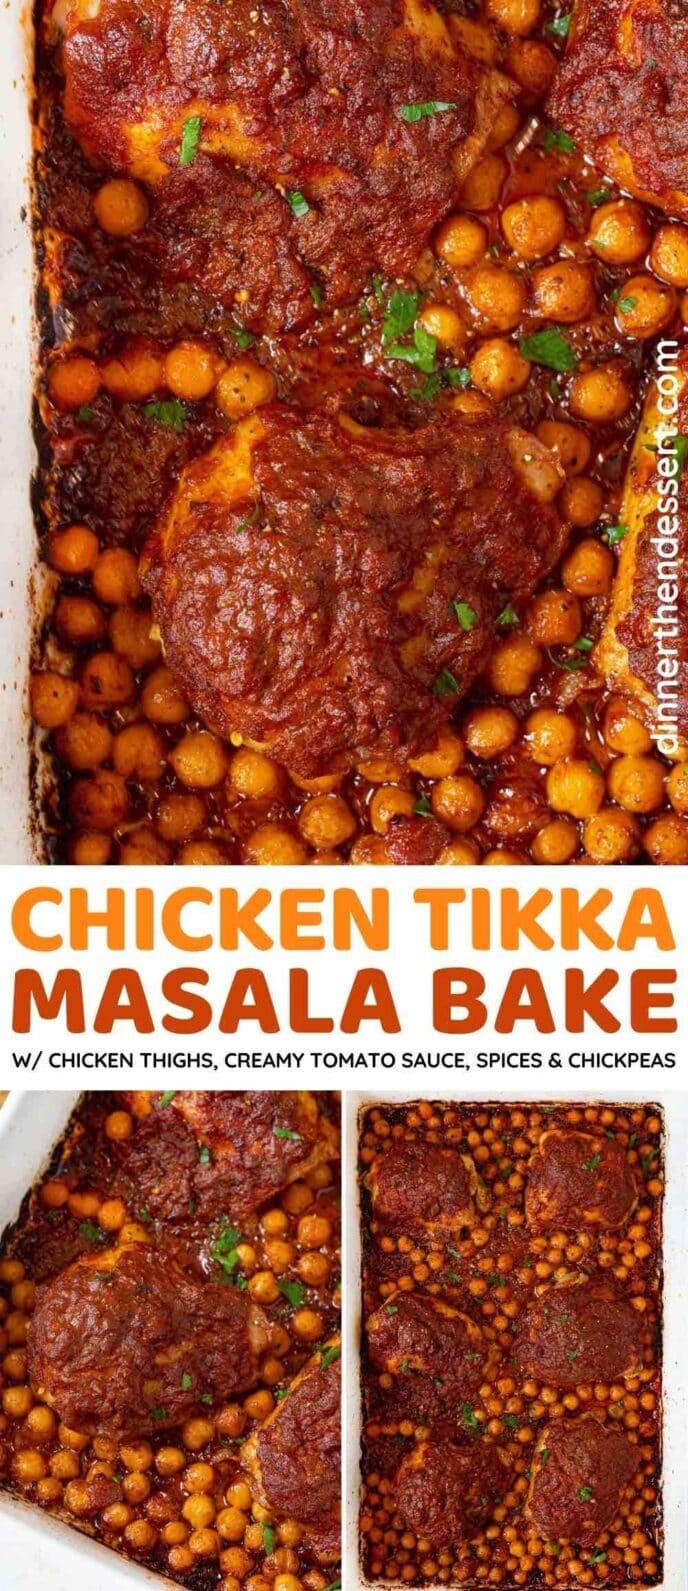 Chicken Tikka Masala Bake collage